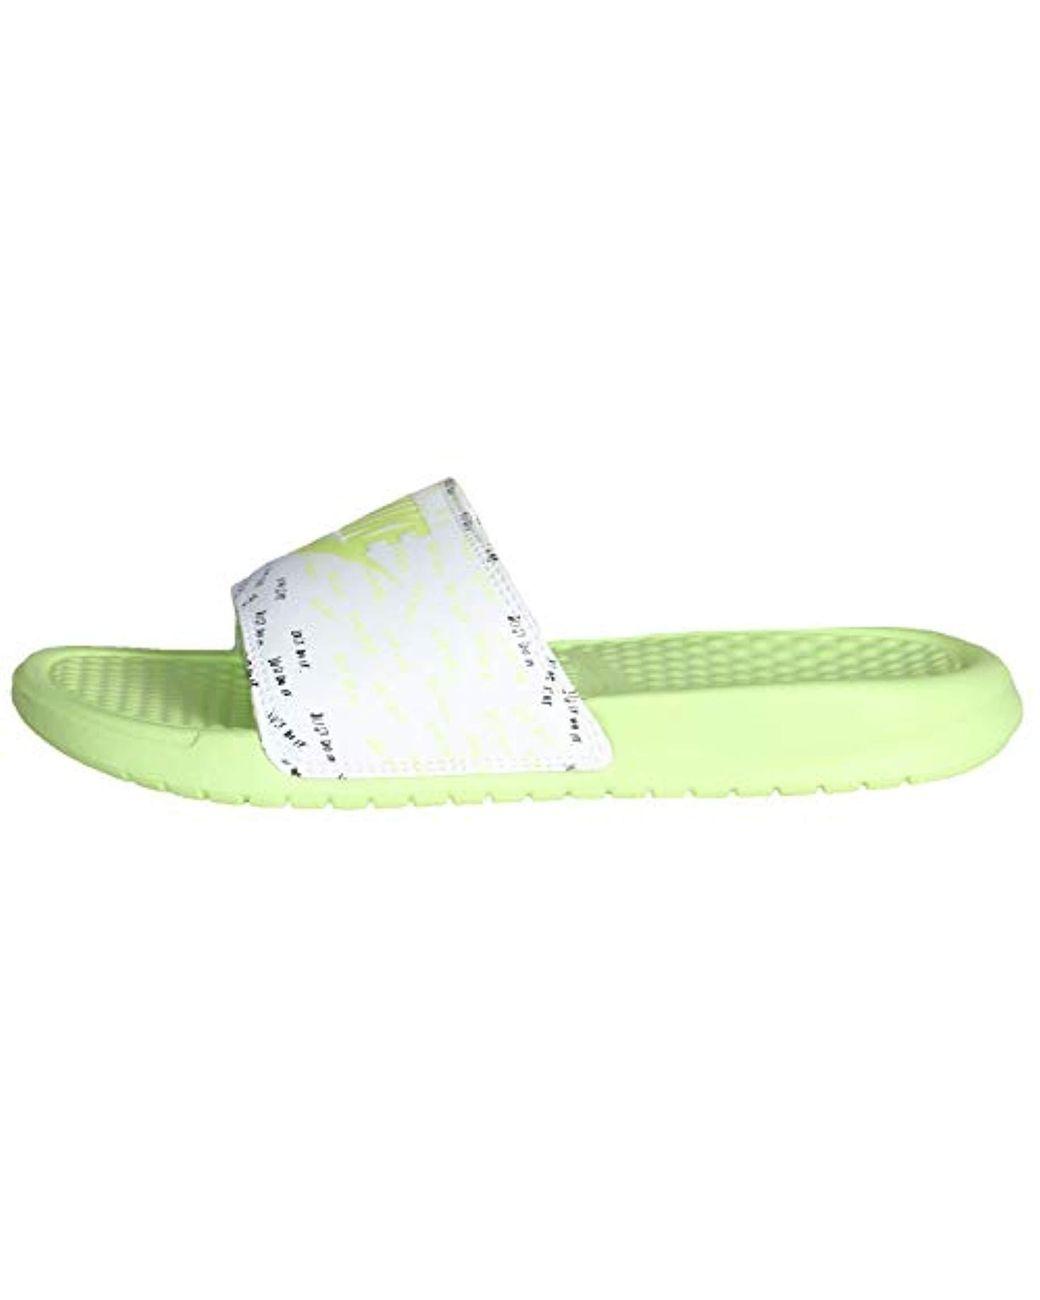 Wmns Jdi Print Liht Nike Benassi Bone 61 OZkXPiu